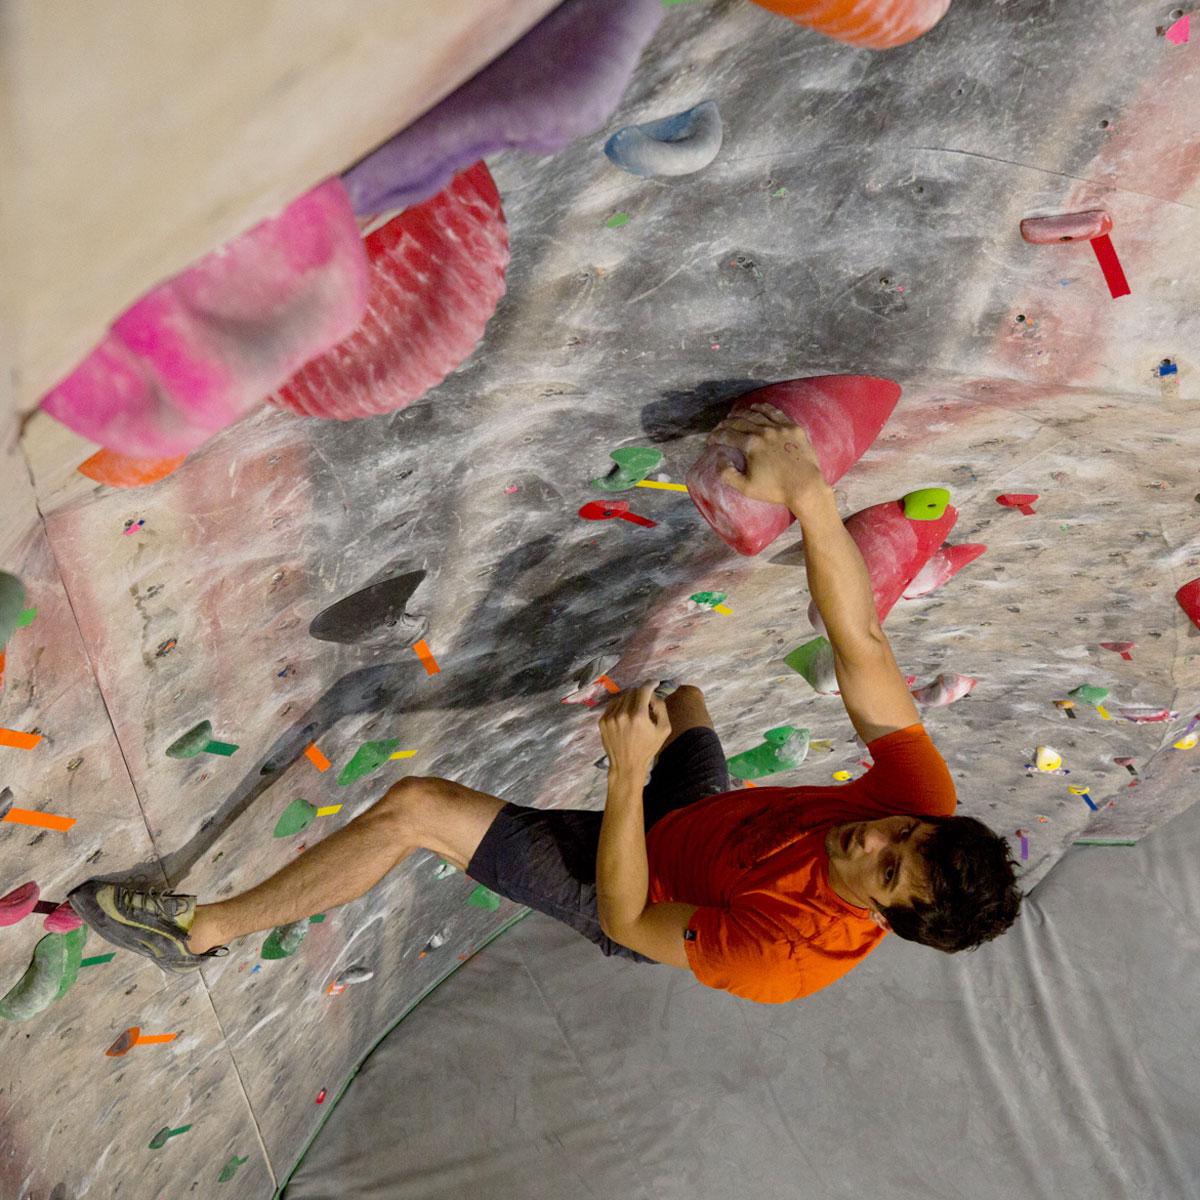 climber-03.jpg